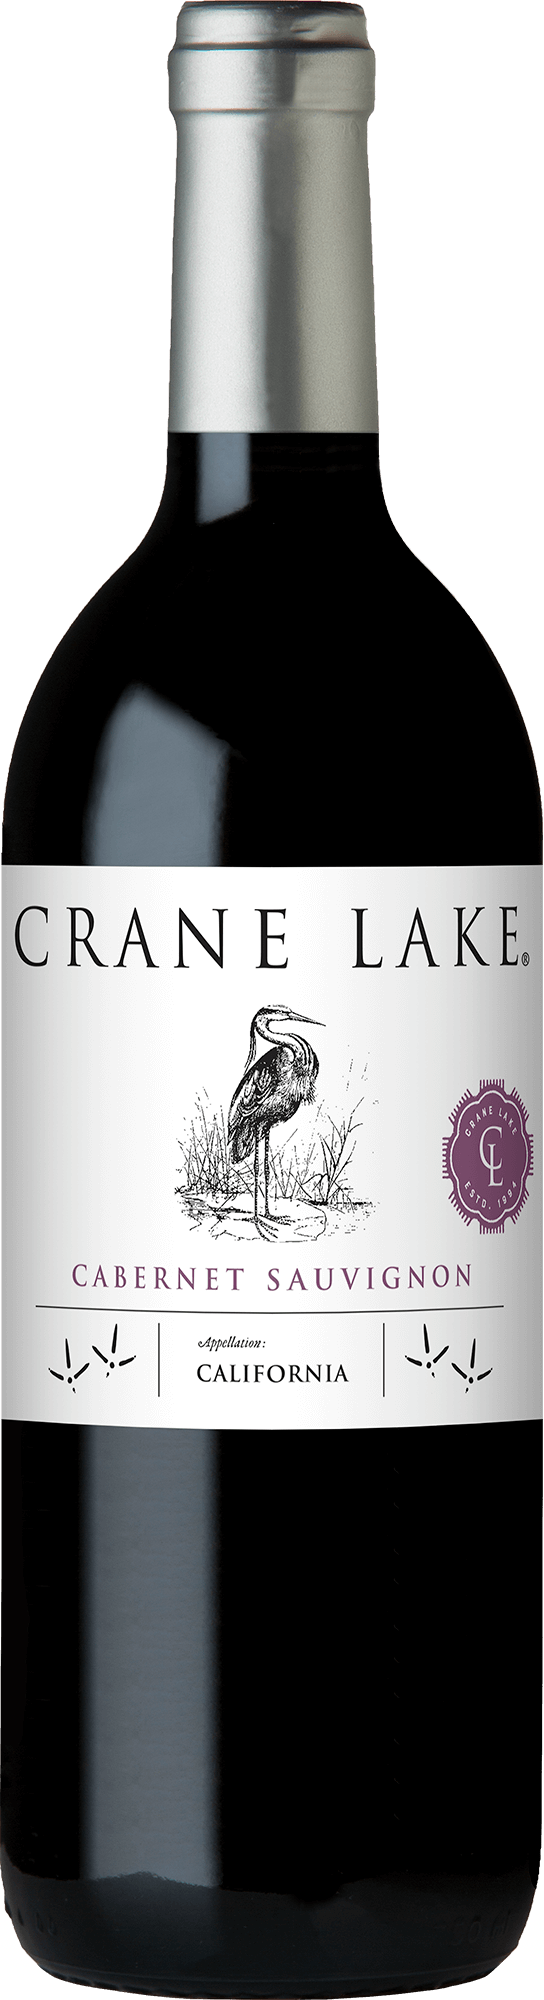 Crane Lake Cabernet Sauvignon Bottleshots